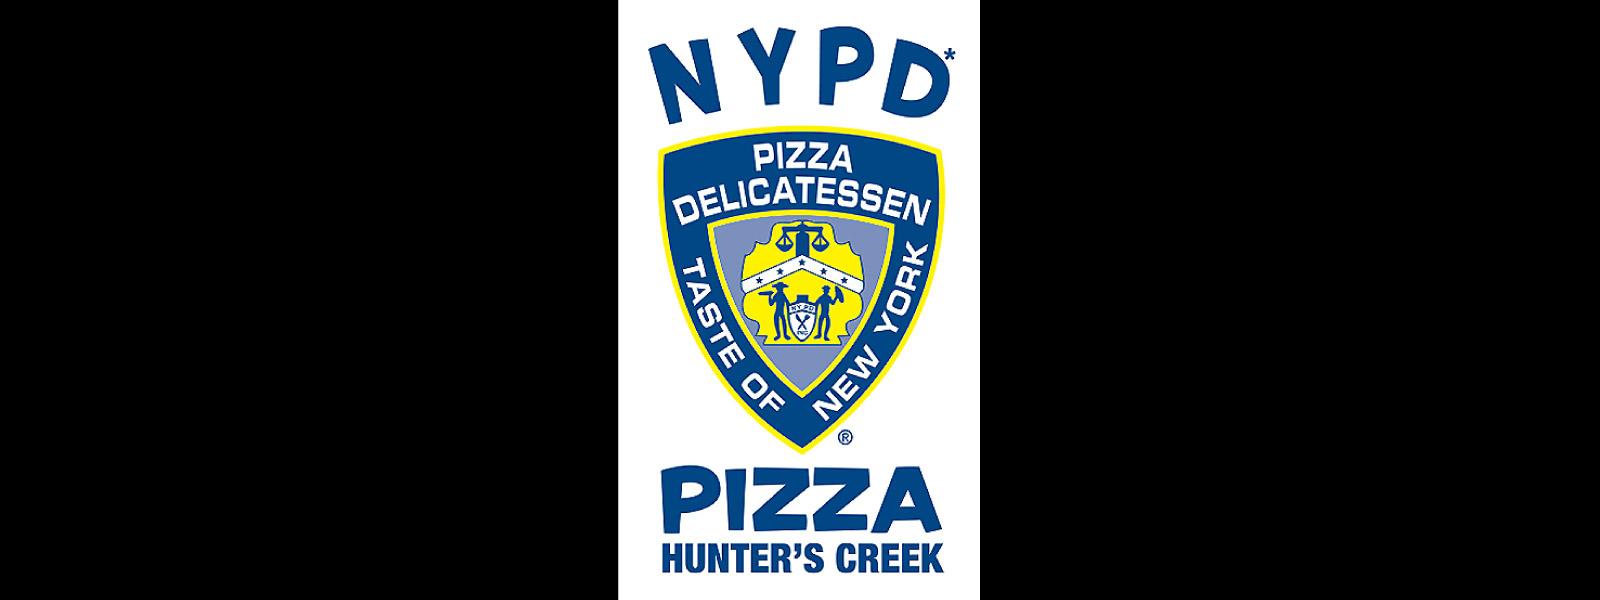 NYPD-header